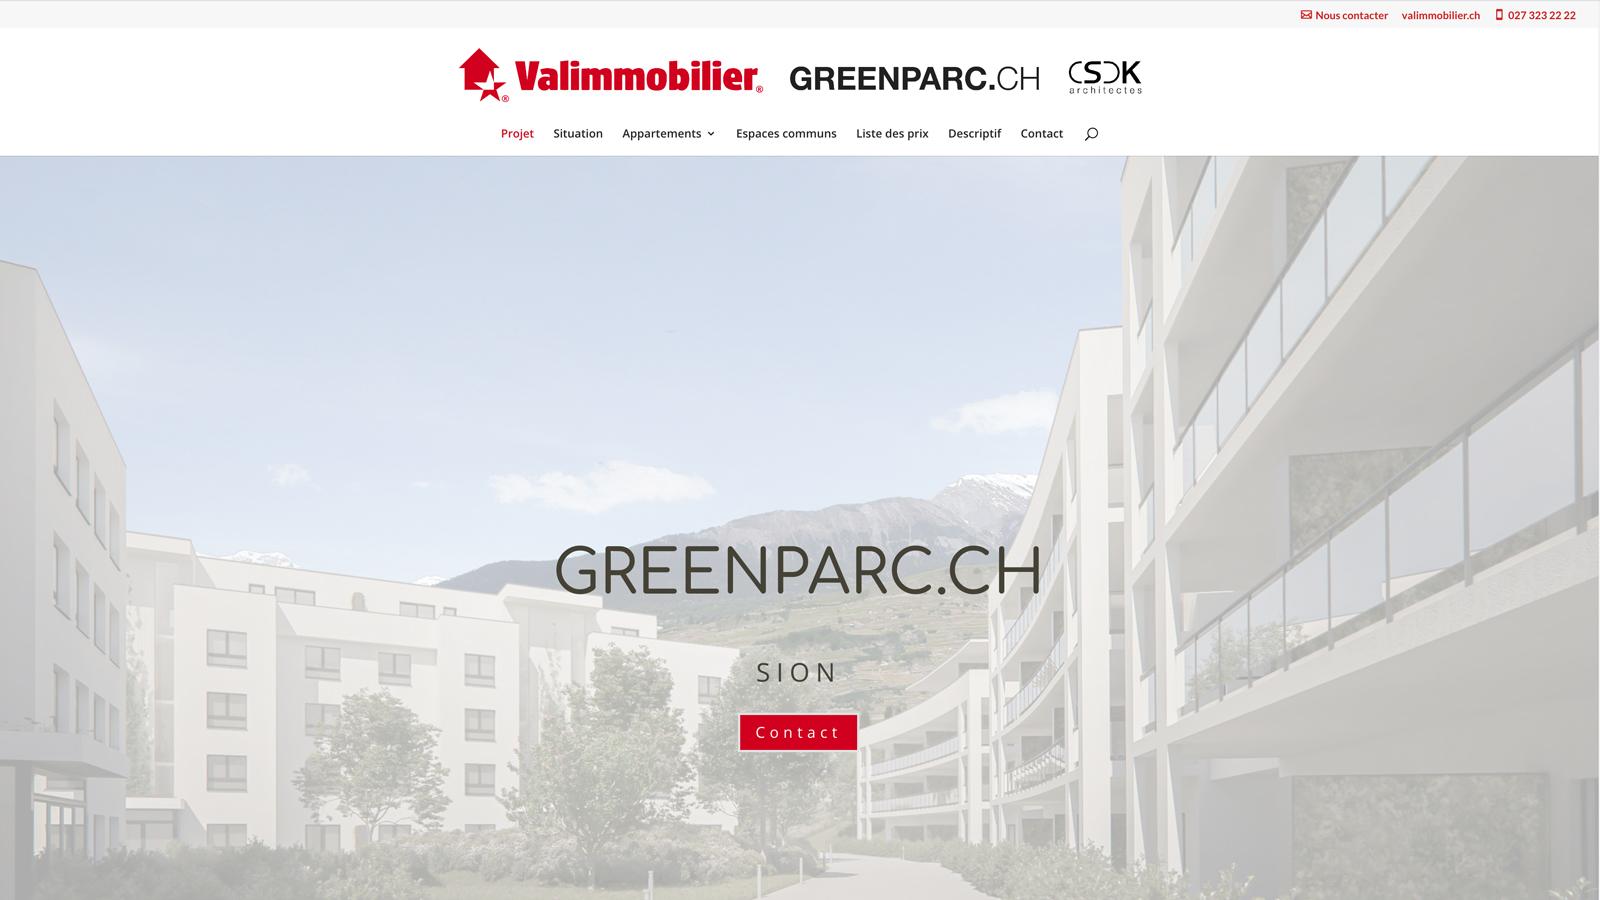 CSDK-Architectes-Sion-Greenparc-Website